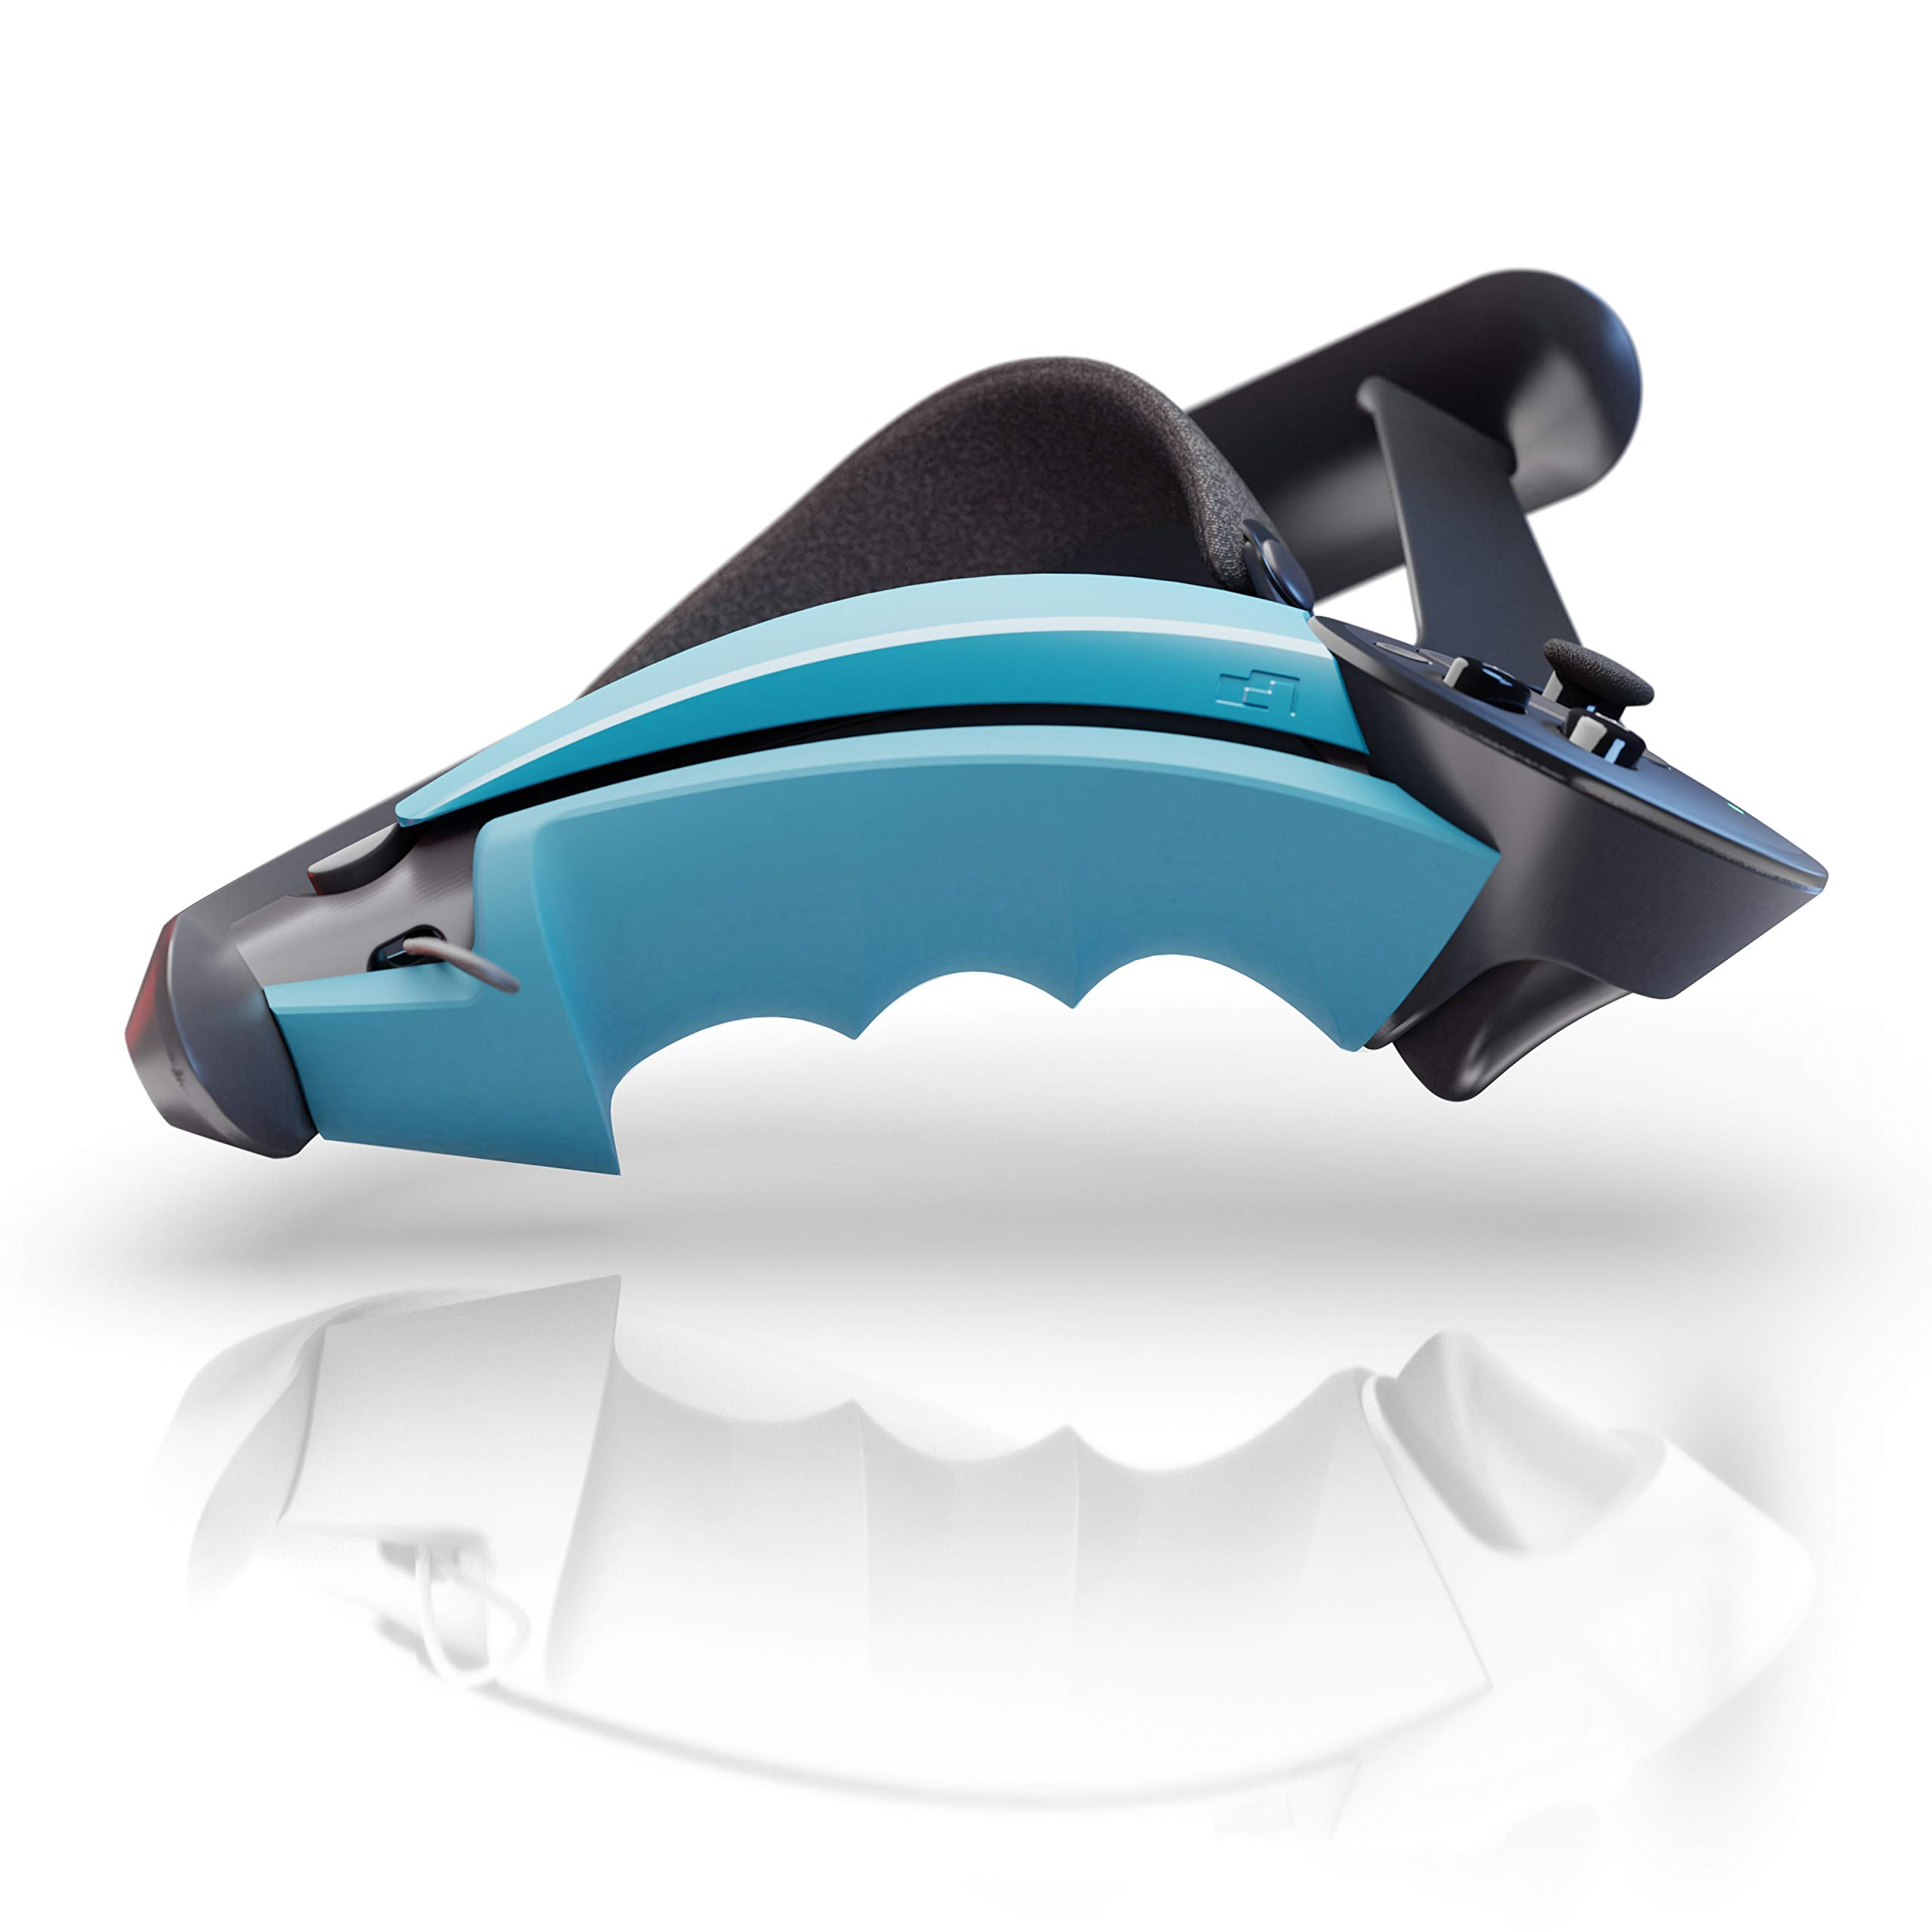 Valve Index VR Controller Grip - Single Left - KNUCKLES DUSTER Light - Ergonomic MOD for Knuckles Virtual Reality Controller